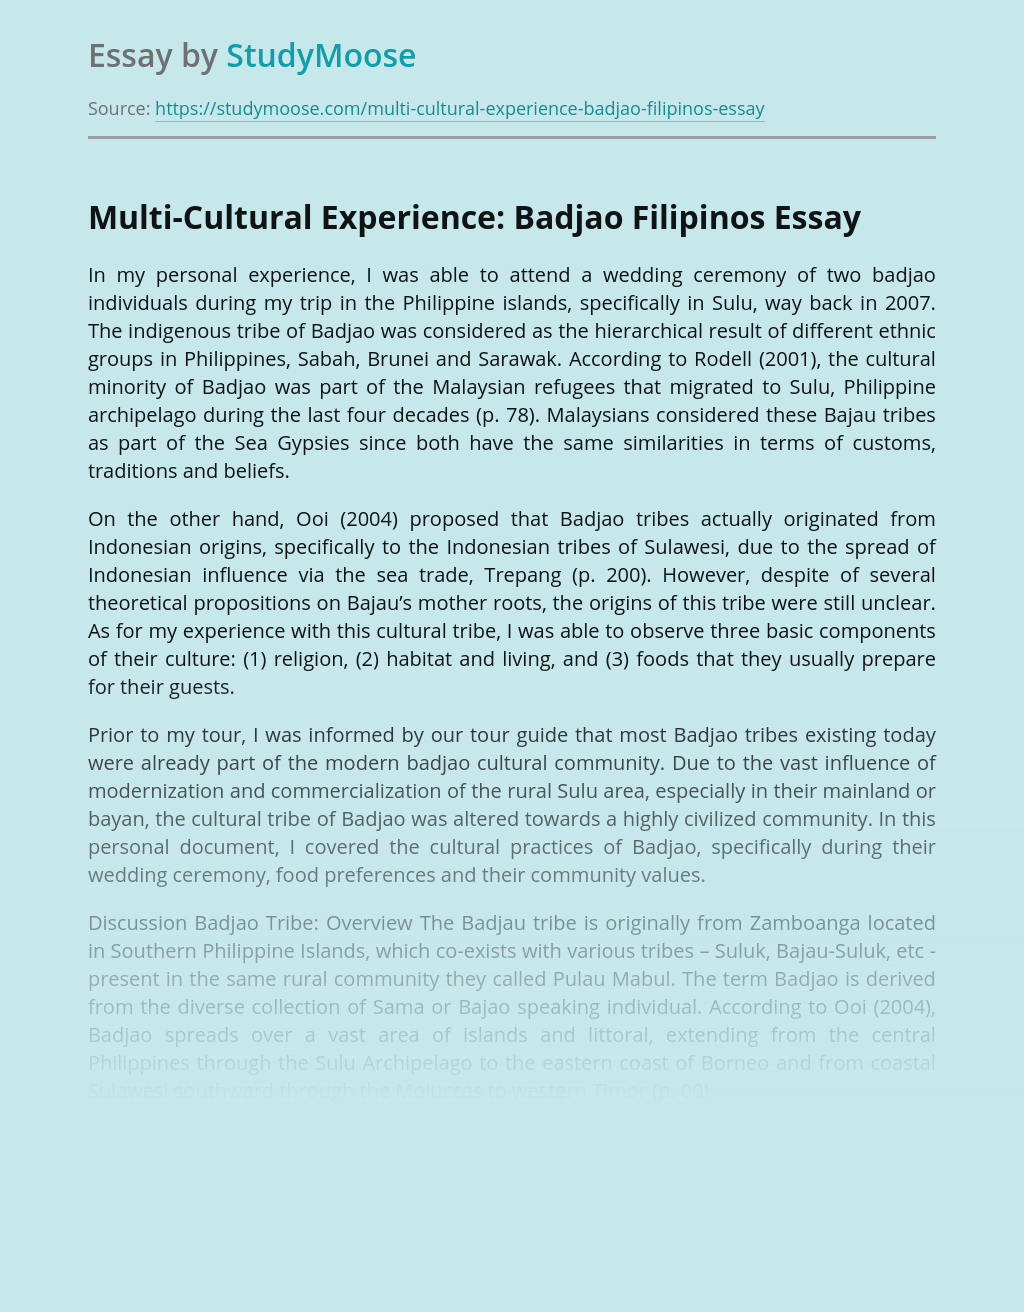 Multi-Cultural Experience: Badjao Filipinos